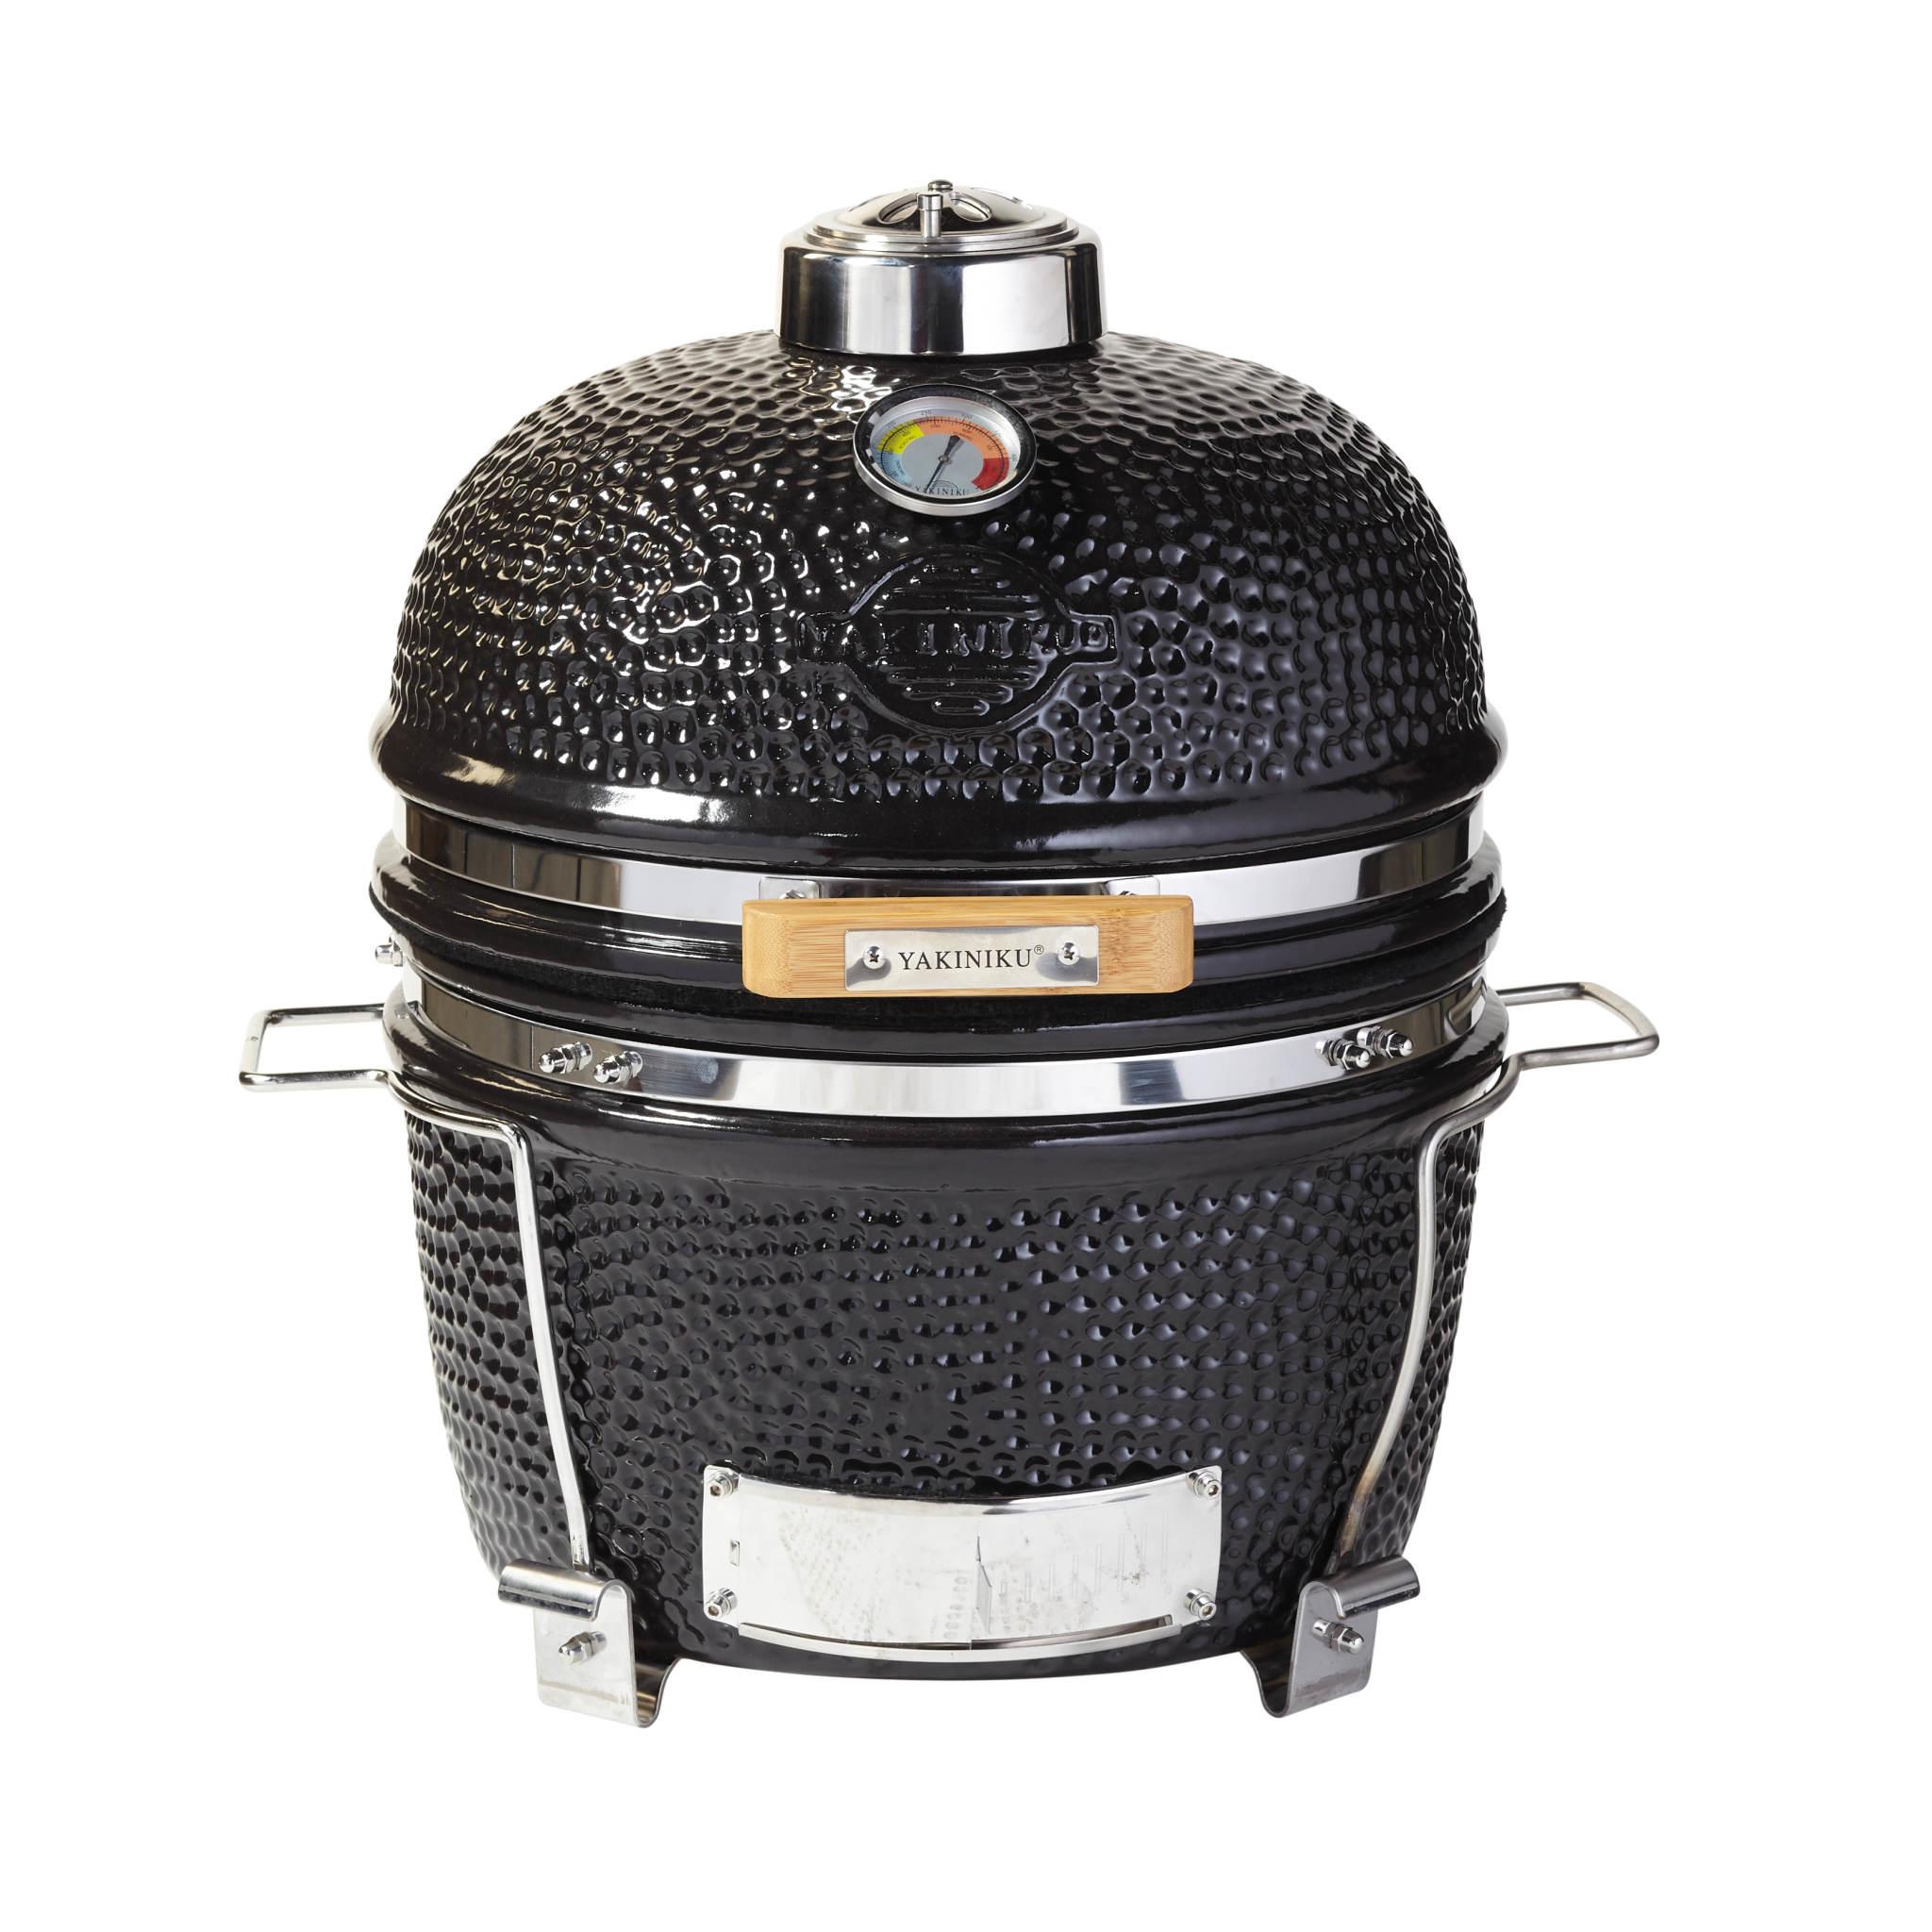 Yakiniku Barbecue Keramisch met Onderstel 14''